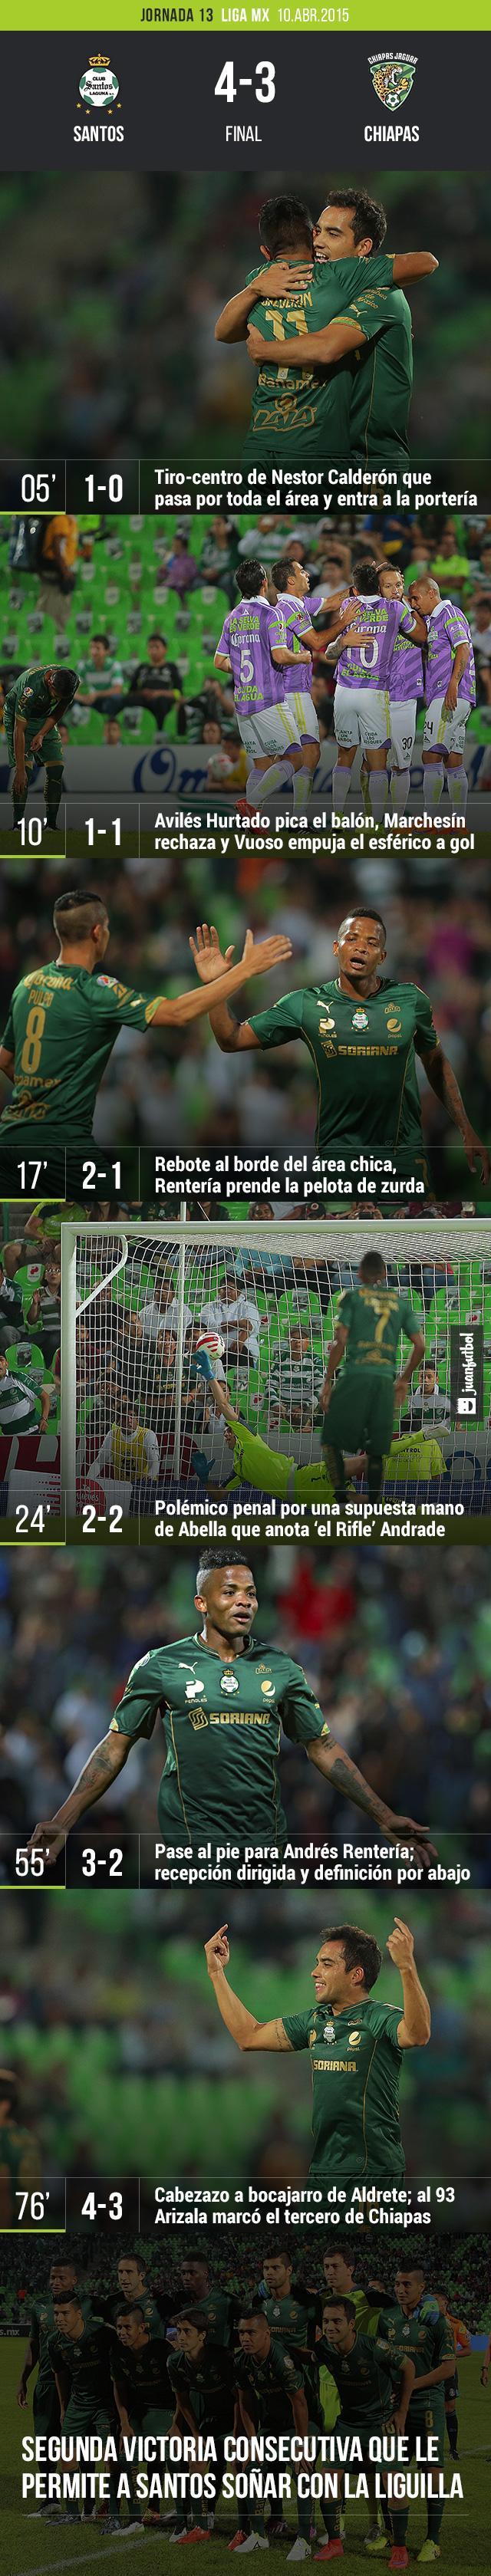 Santos 4-3 Chiapas